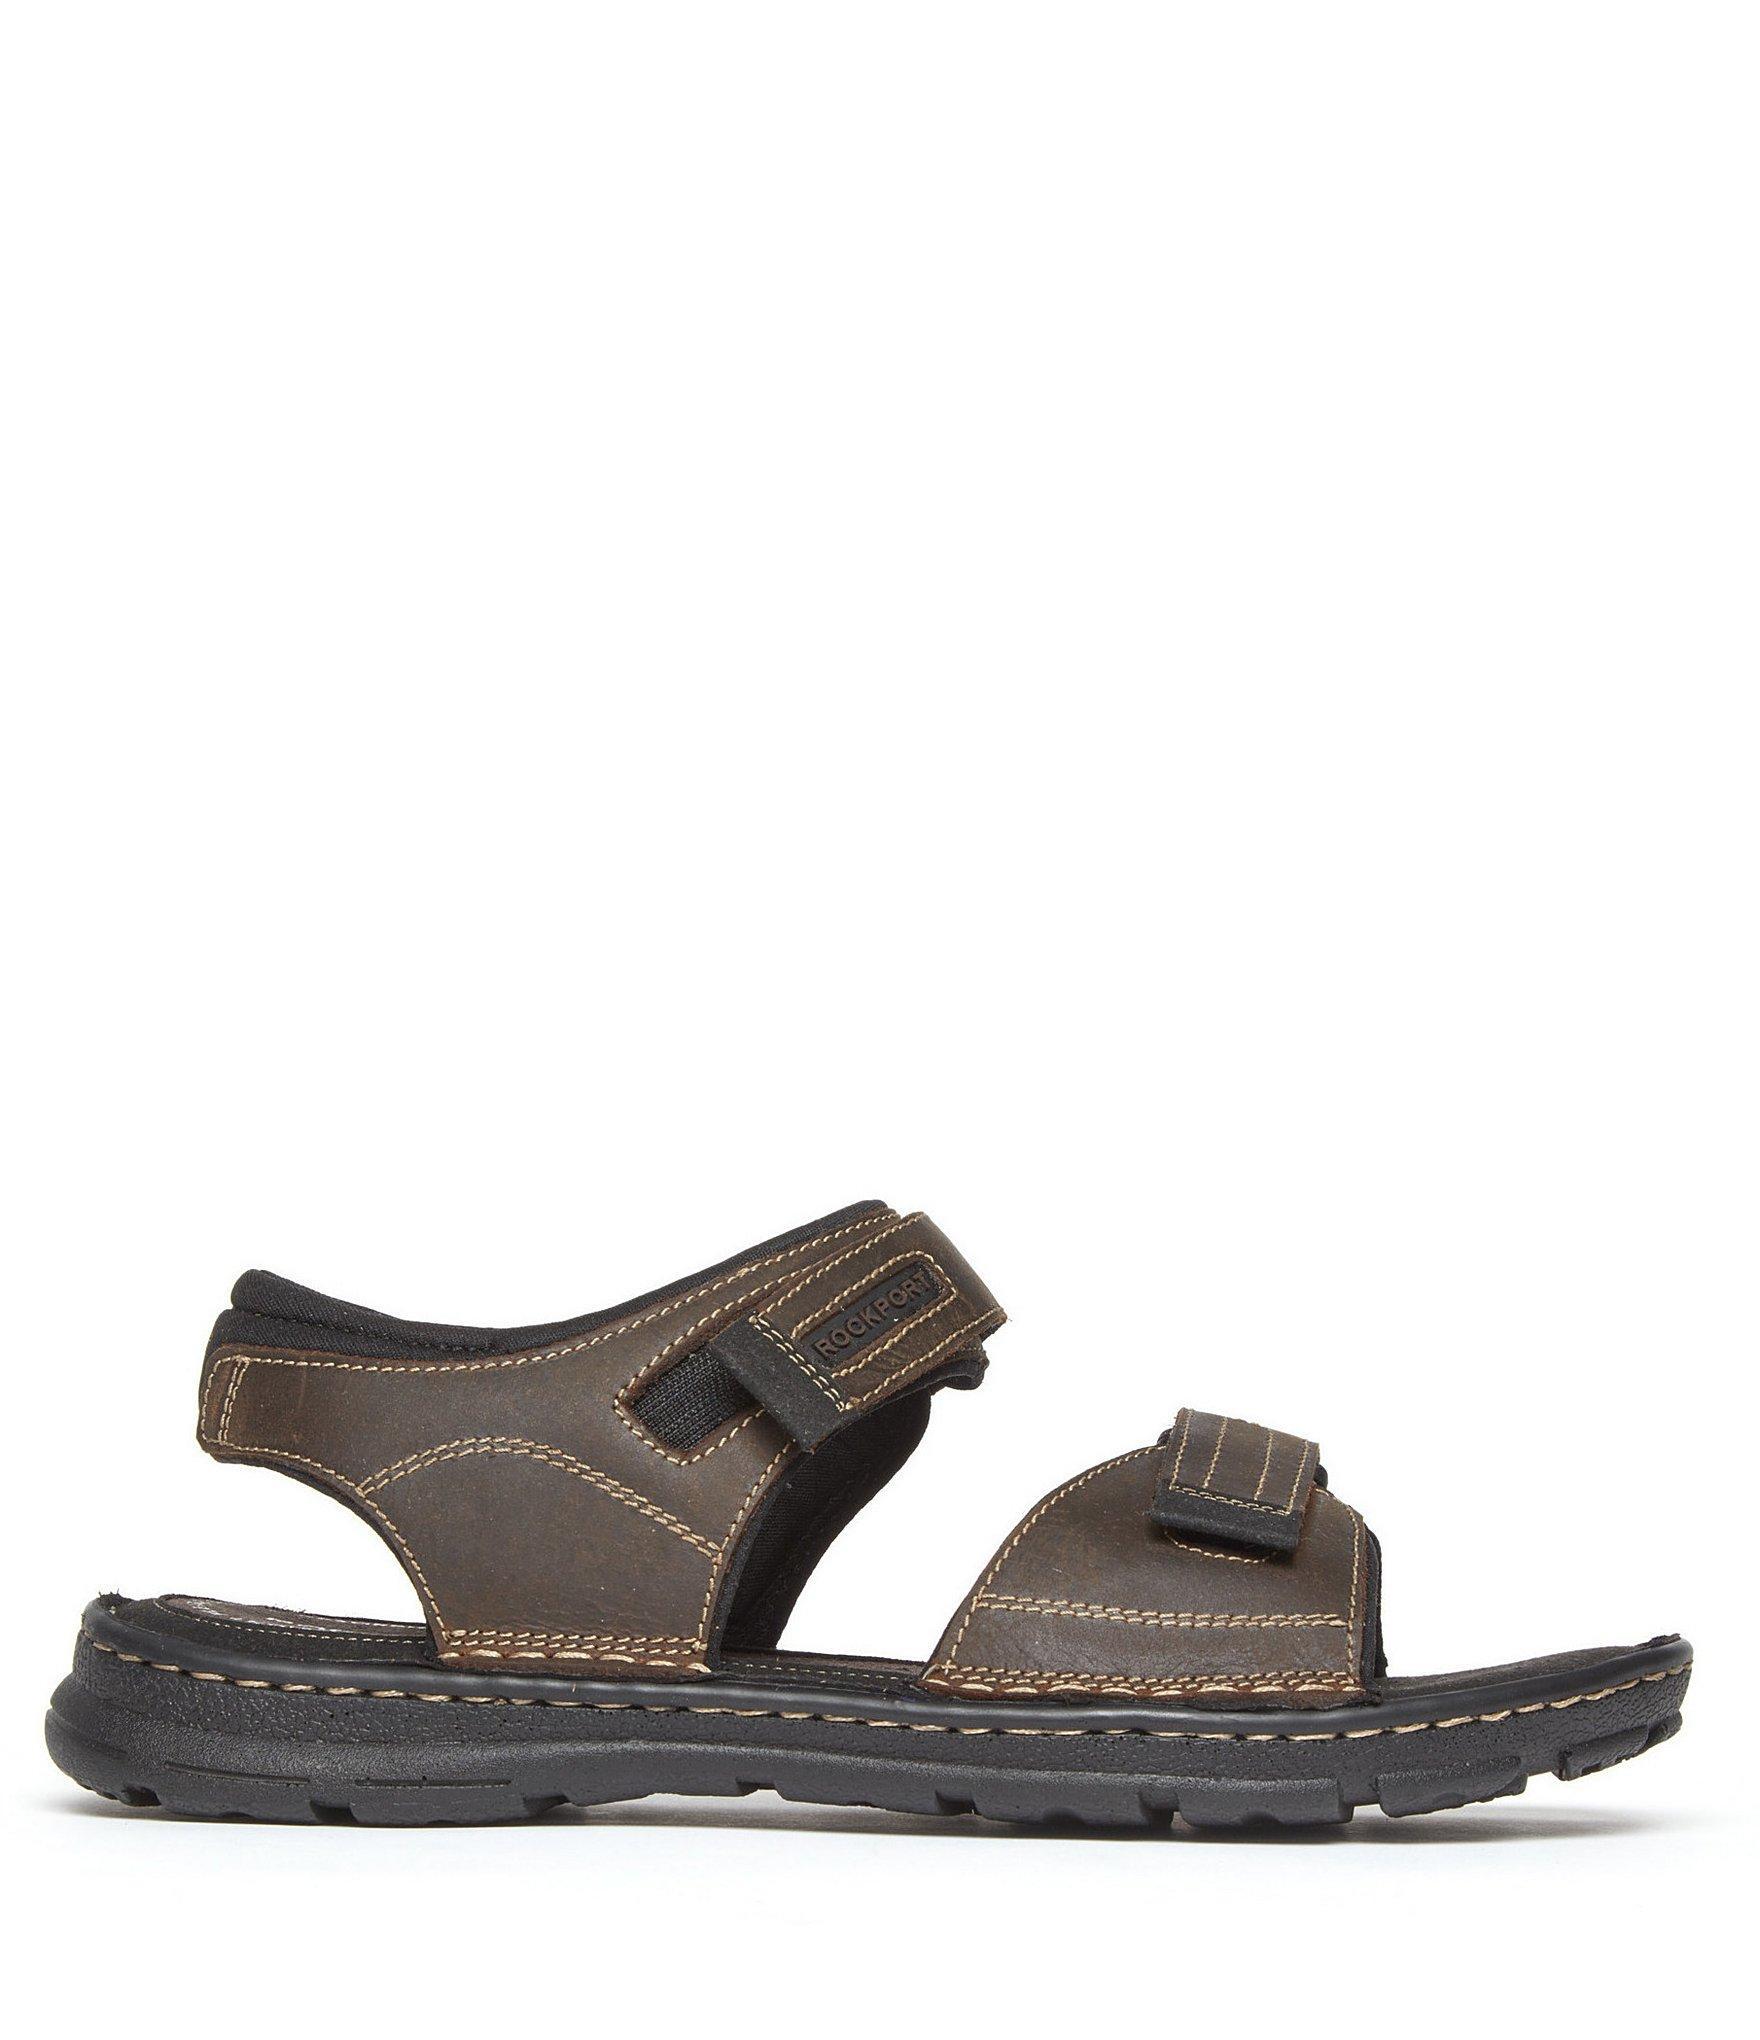 e63b50c0b5e5e8 Lyst - Rockport Men s Leather Darwyn Quarter Strap Sandal in Brown ...